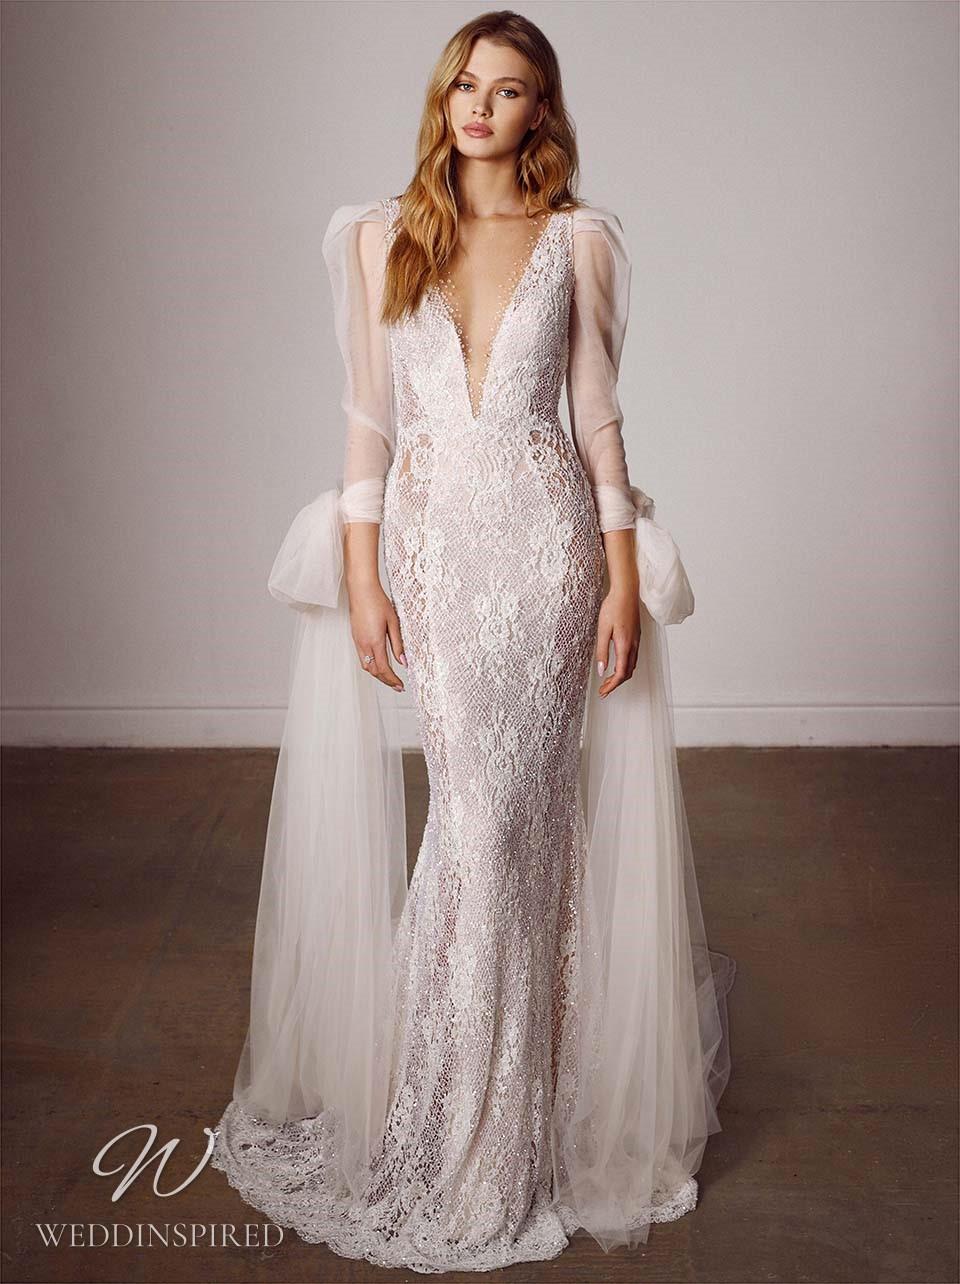 A Galia Lahav 2022 lace mermaid wedding dress with a v neck and long sleeves